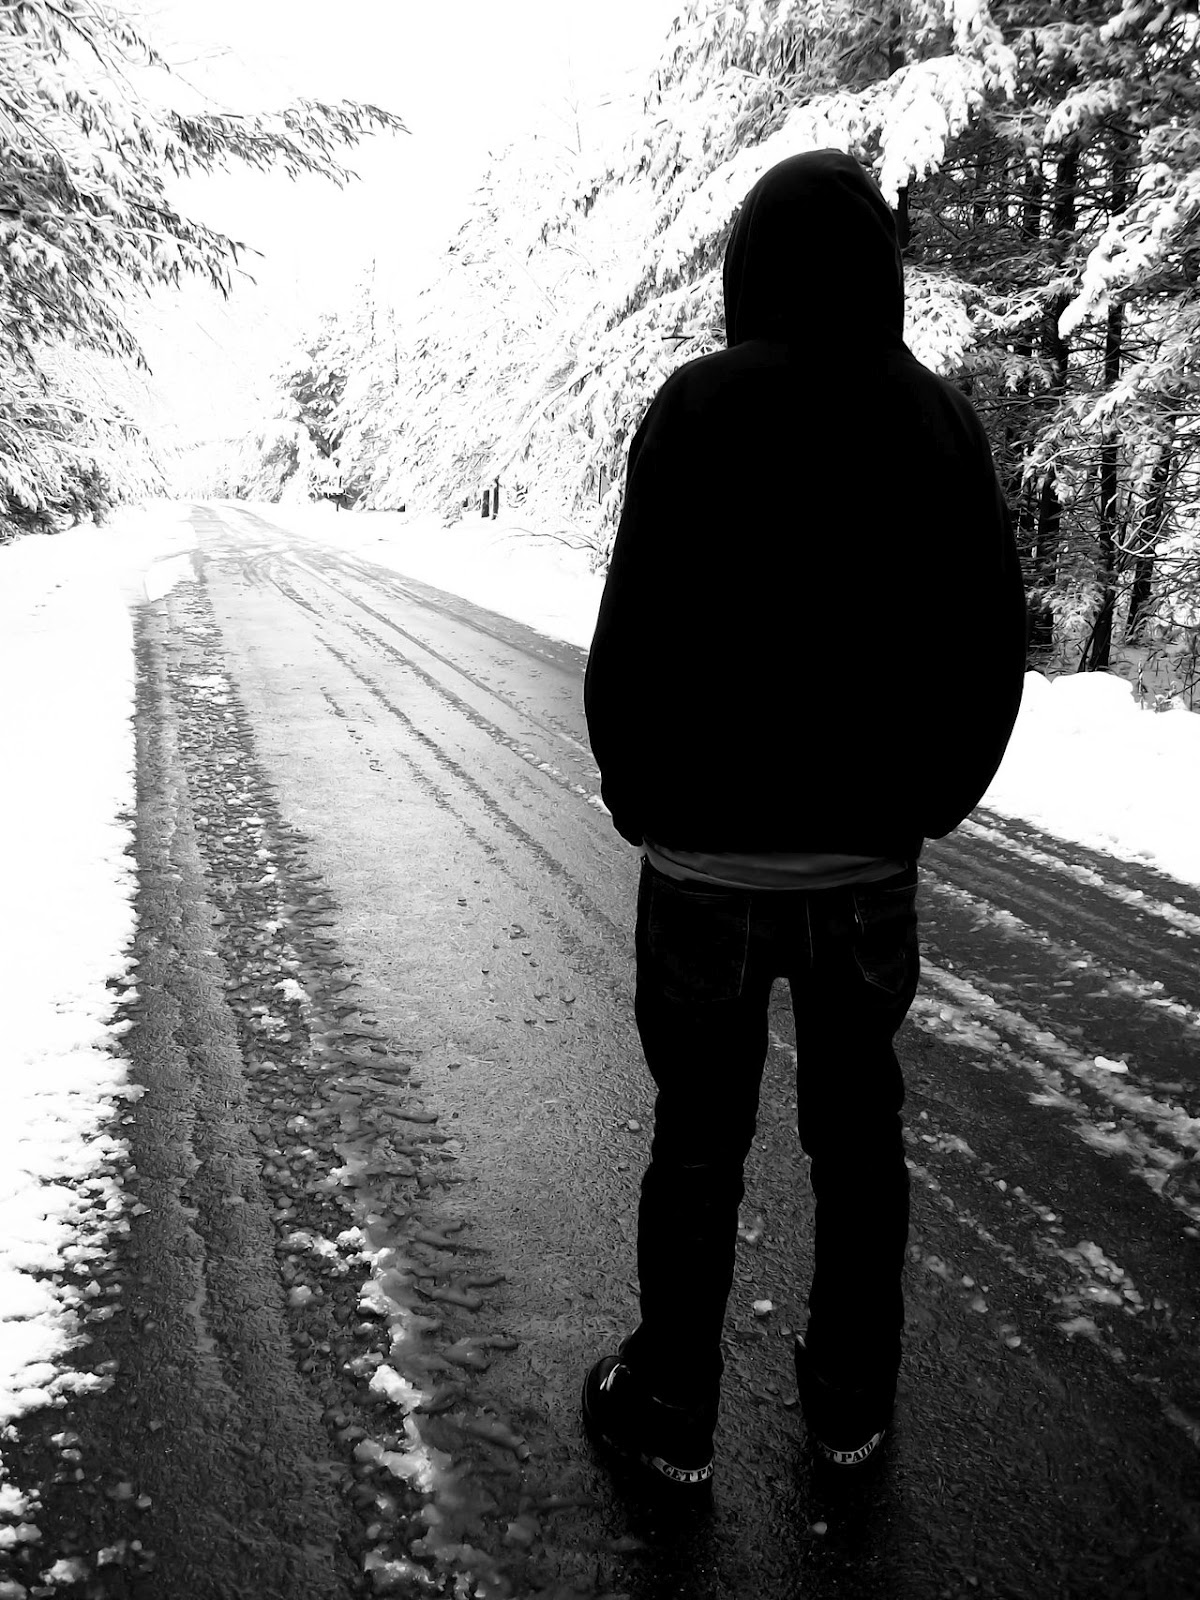 http://1.bp.blogspot.com/-k9G_pzIE3o0/UMLVvGgffcI/AAAAAAAAAQE/YfPCBVly2RU/s1600/alone+love+lonely+sad+emotional+missing+u+miss+girls+boys+wallpapers+(13).jpg